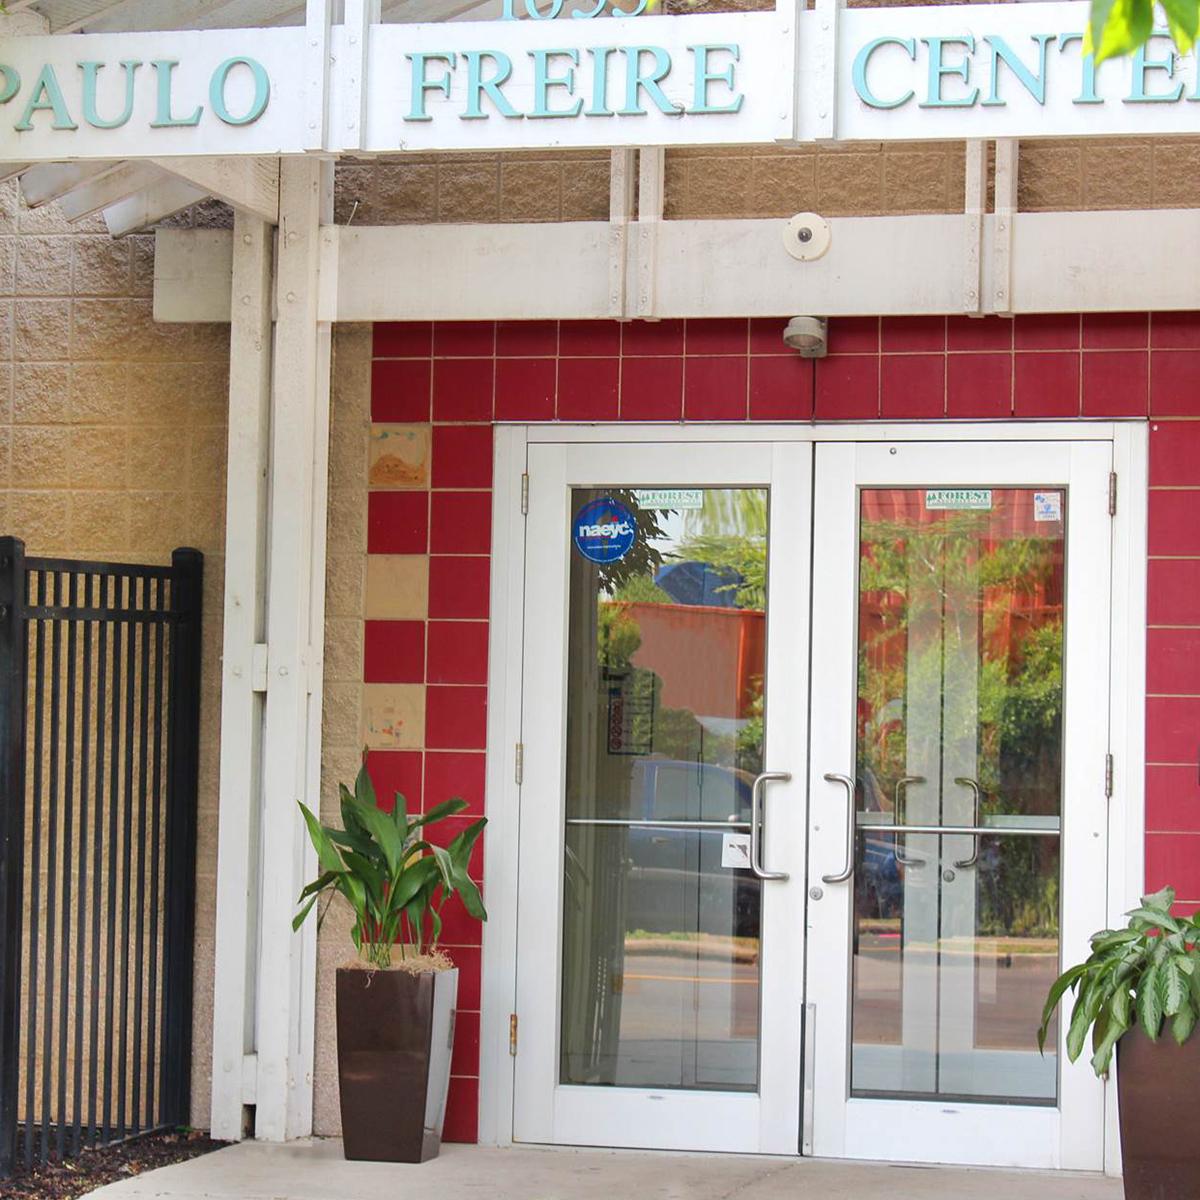 Paulo Freire Center